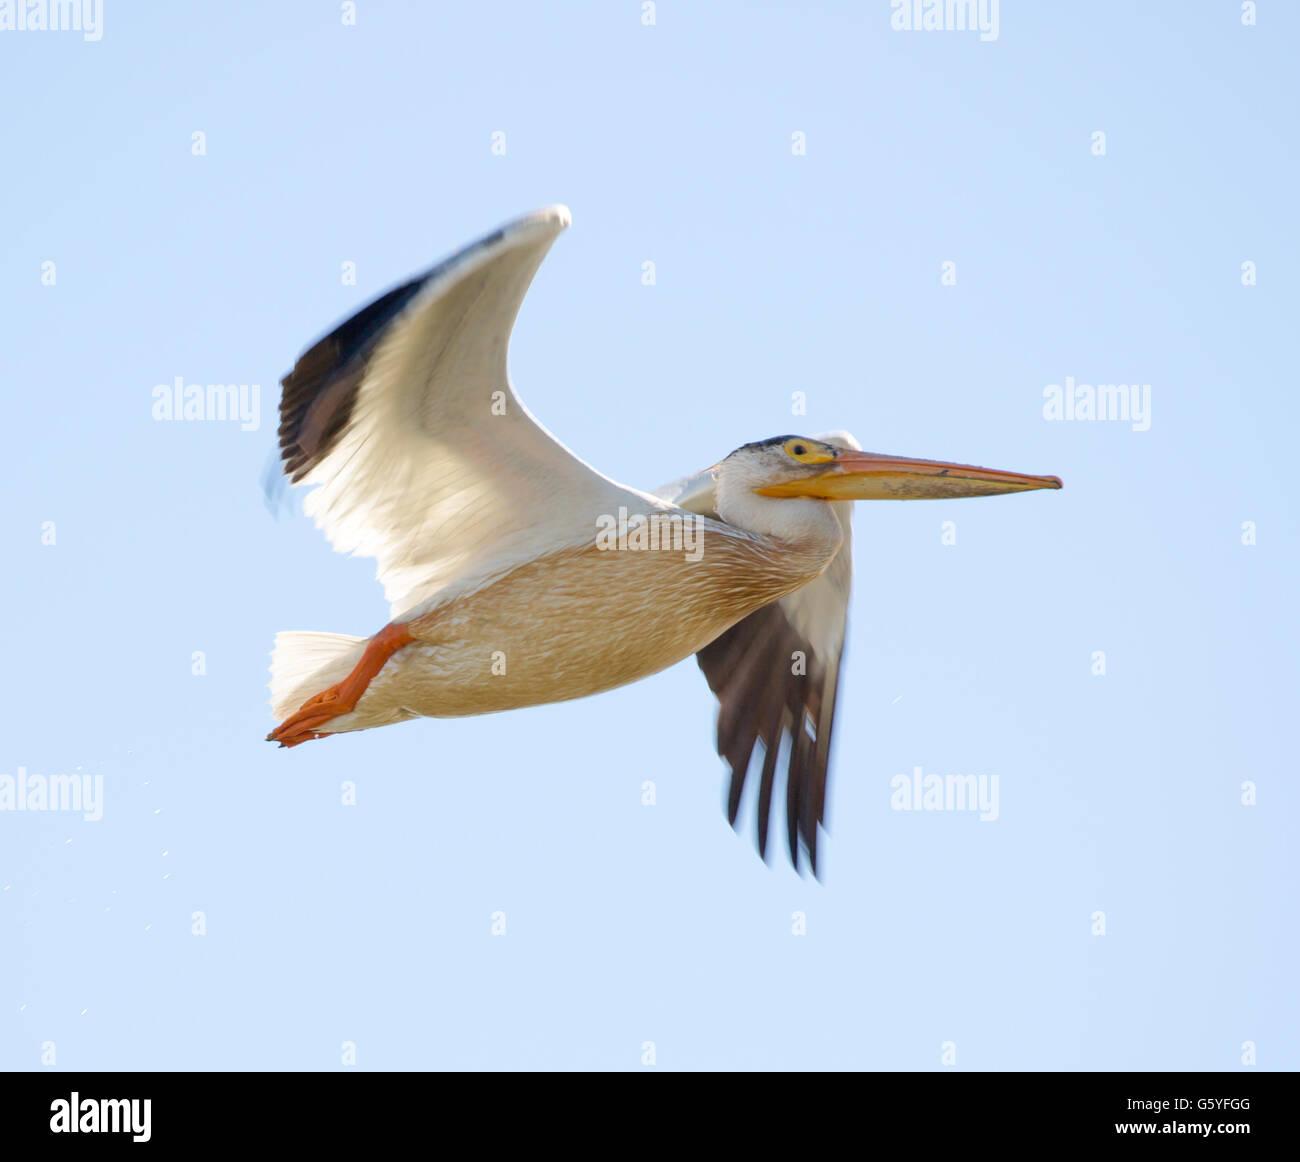 Pelicans Pelecanus Erythrorhynchos: Pelecanus Erythrorhynchos Stock Photos & Pelecanus